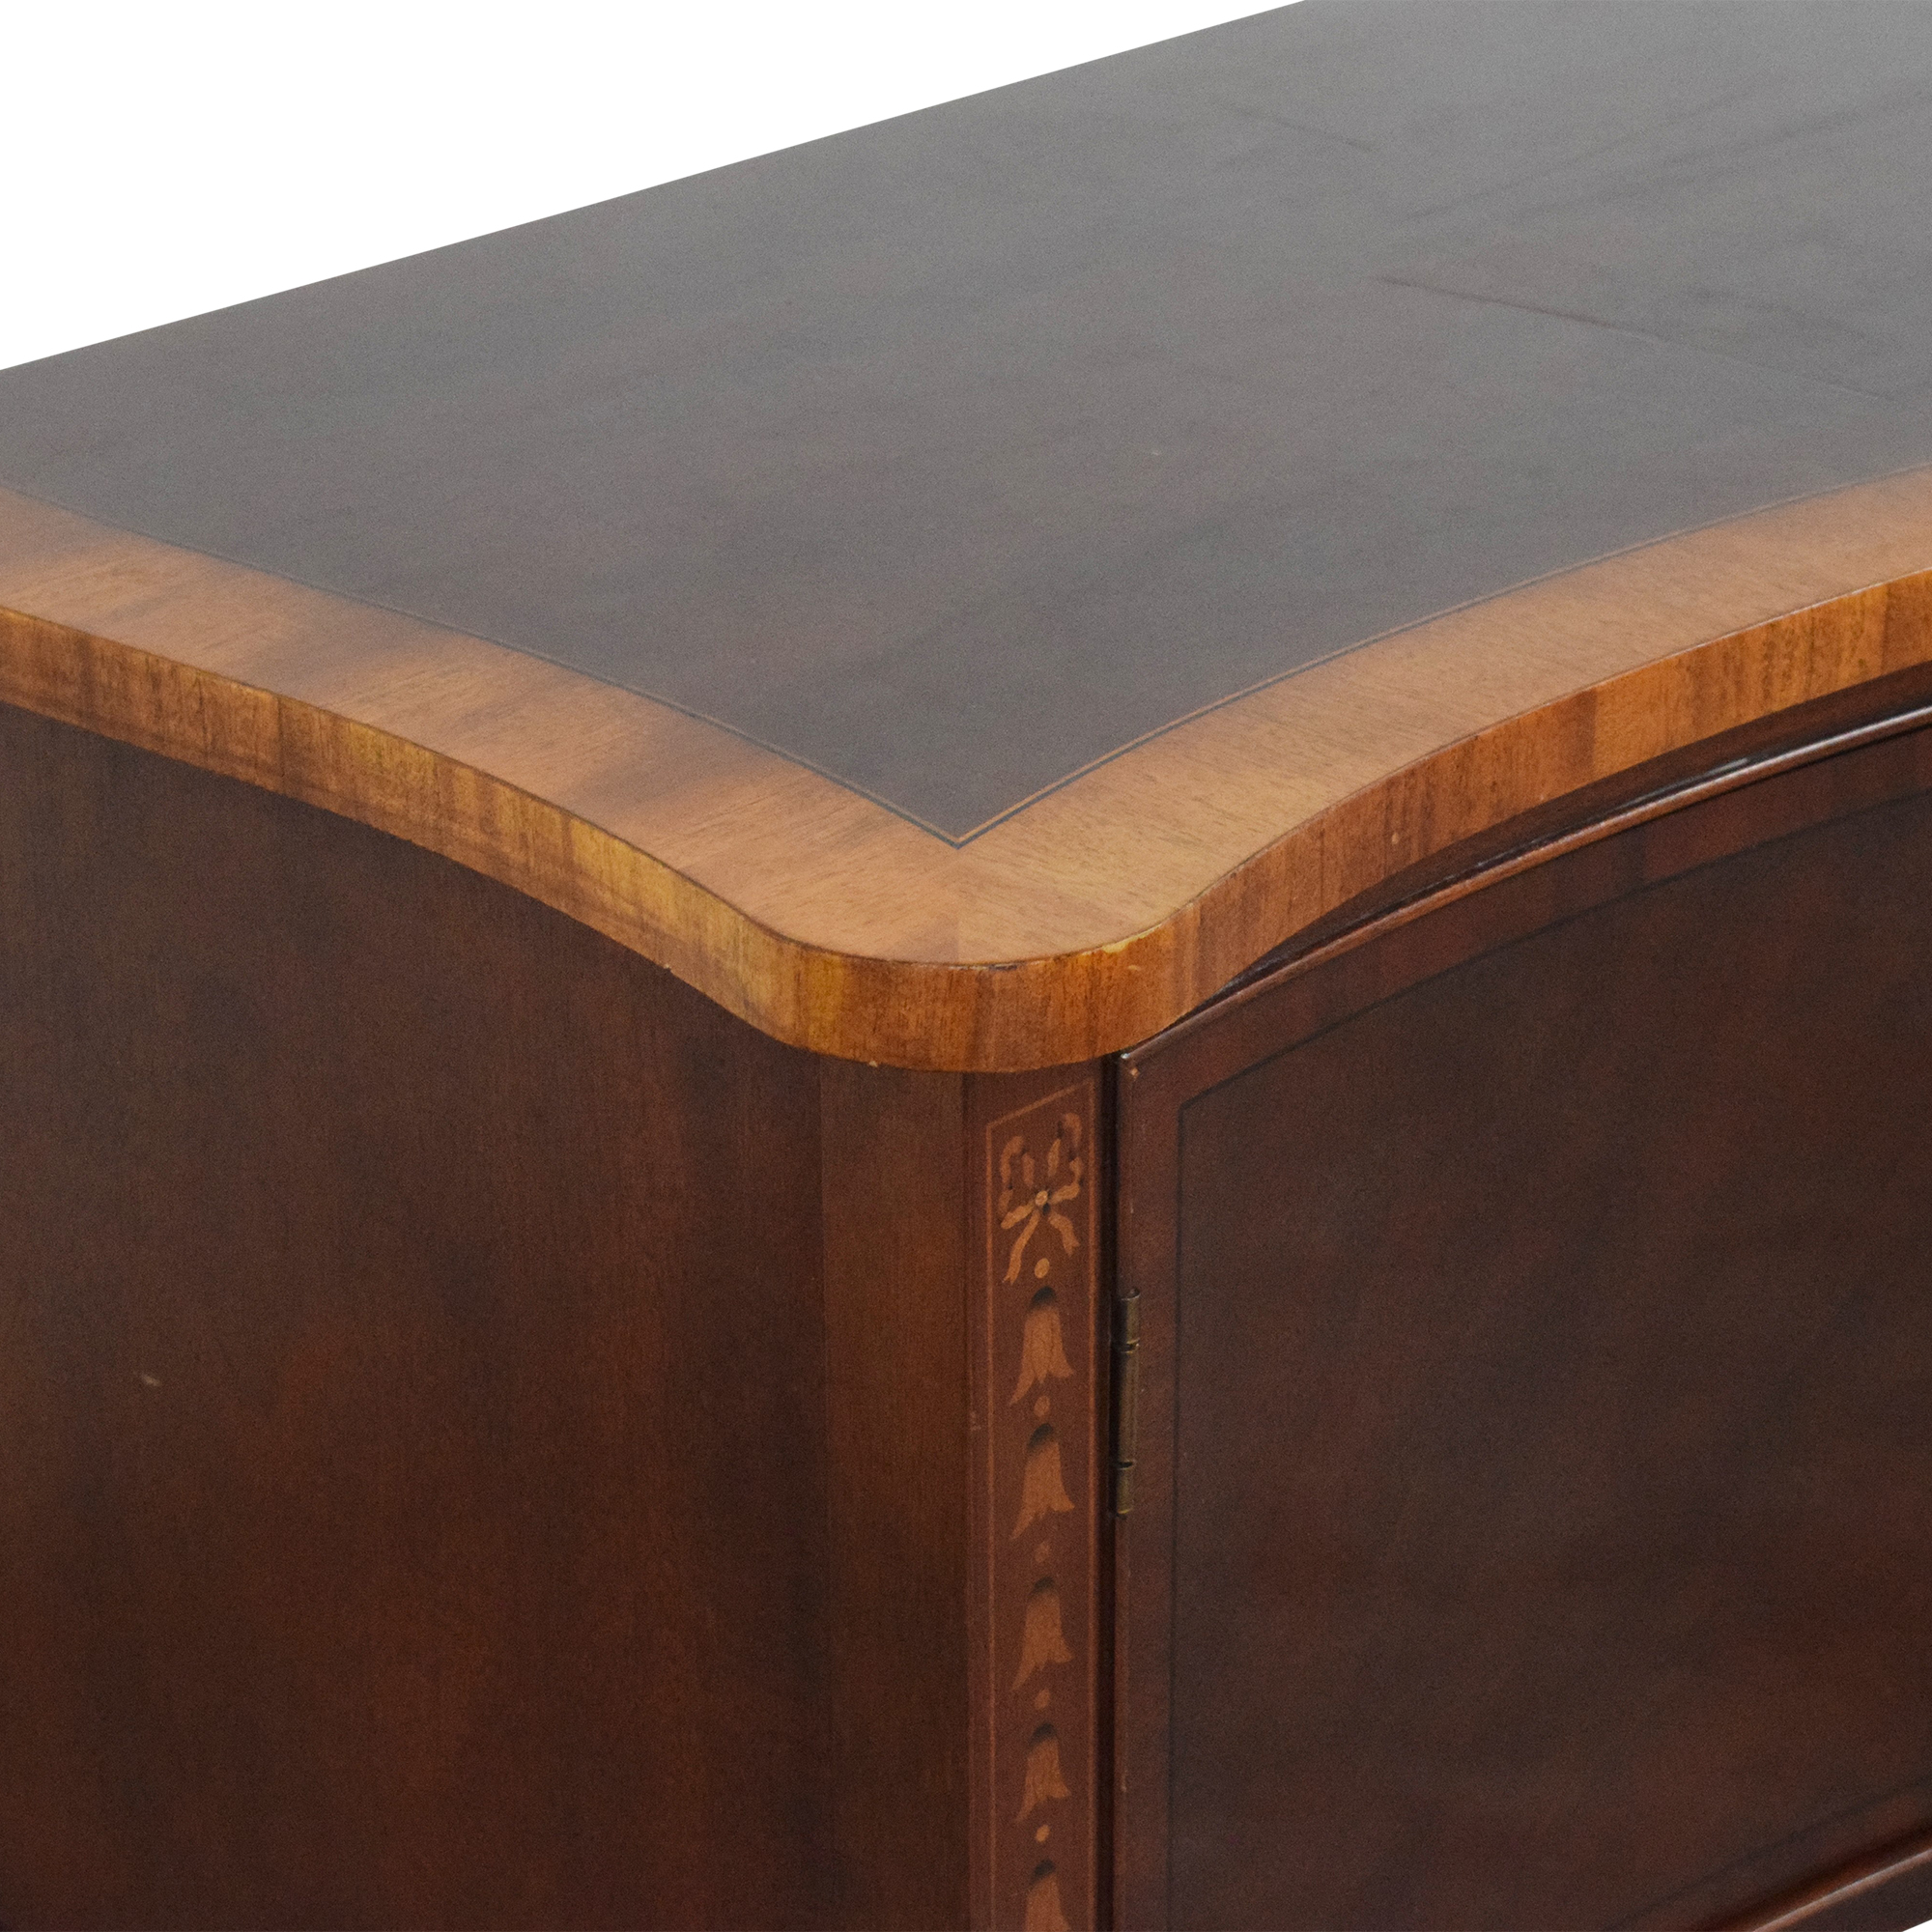 Ethan Allen Ethan Allen 18th Century Collection Hepplewhite Sideboard on sale